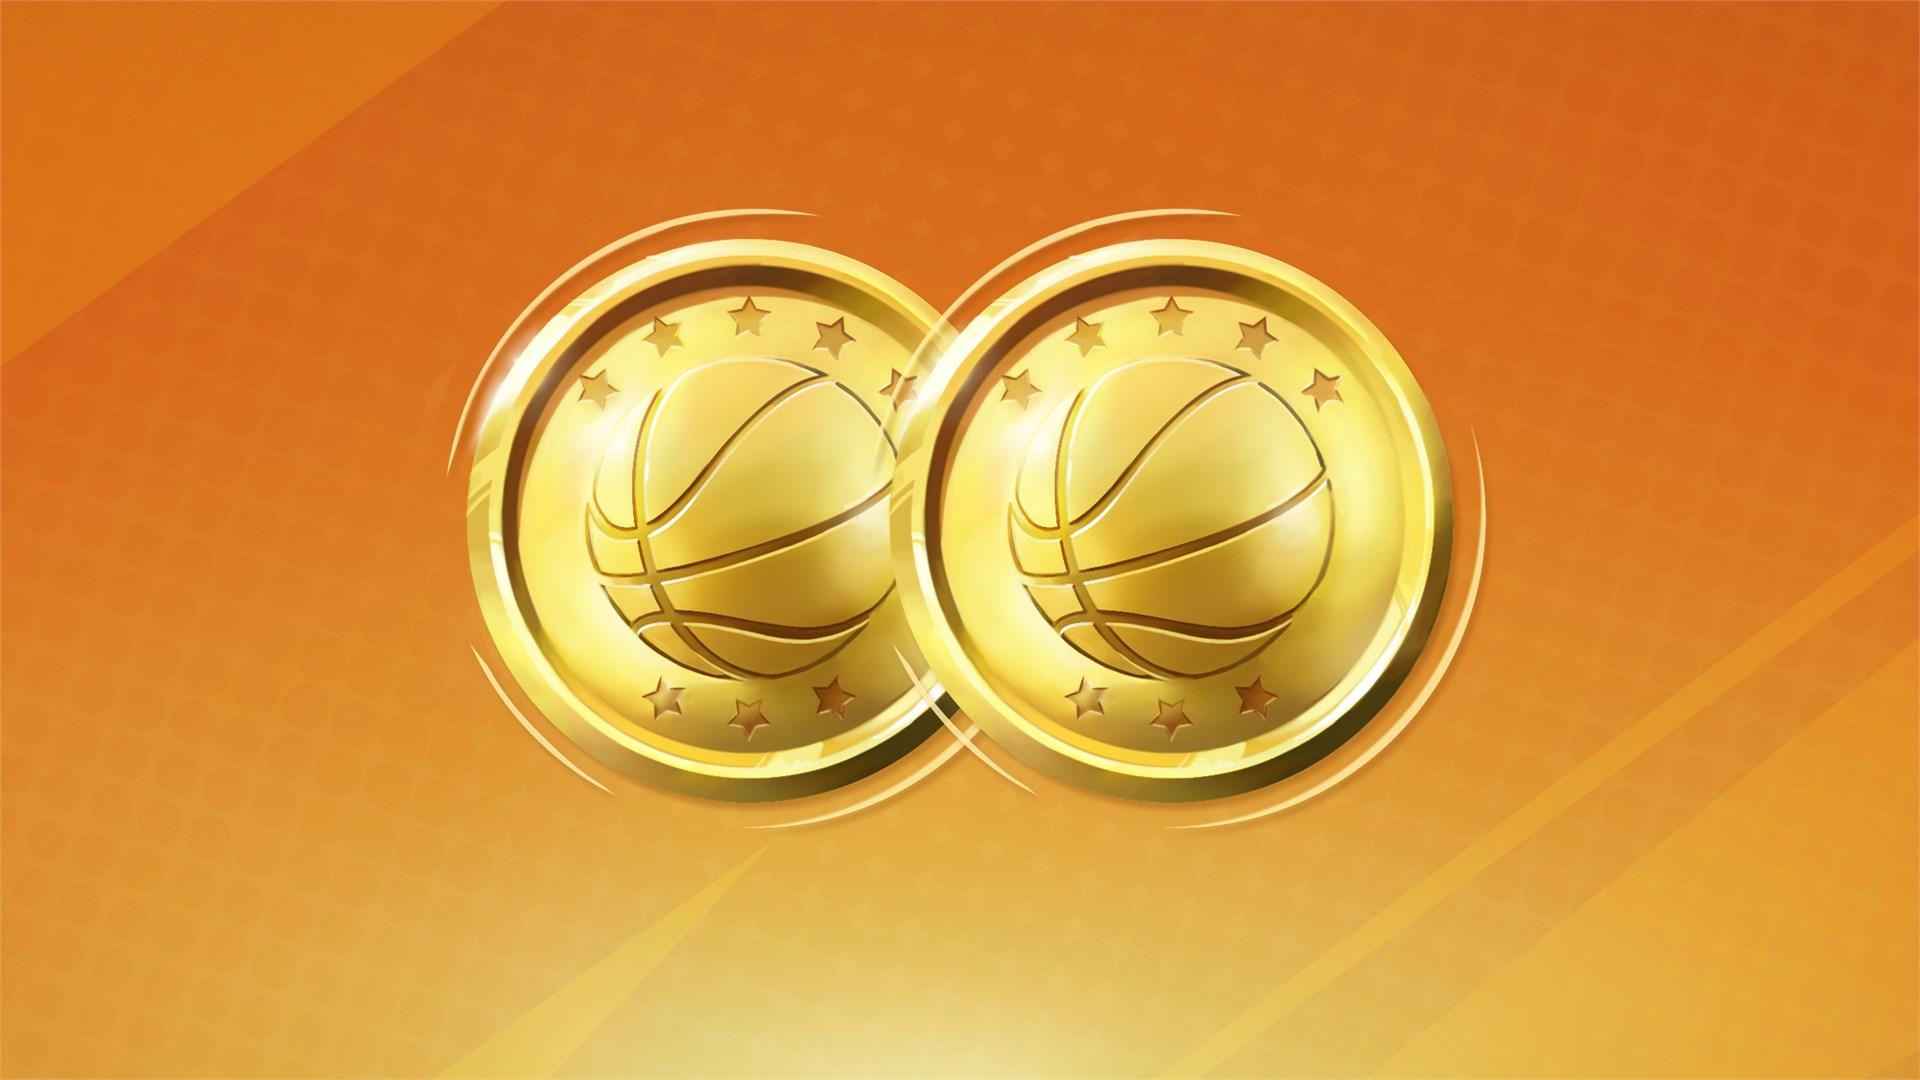 NBA 2K Playgrounds 2 Golden Bucks Bundle - 7500 VC